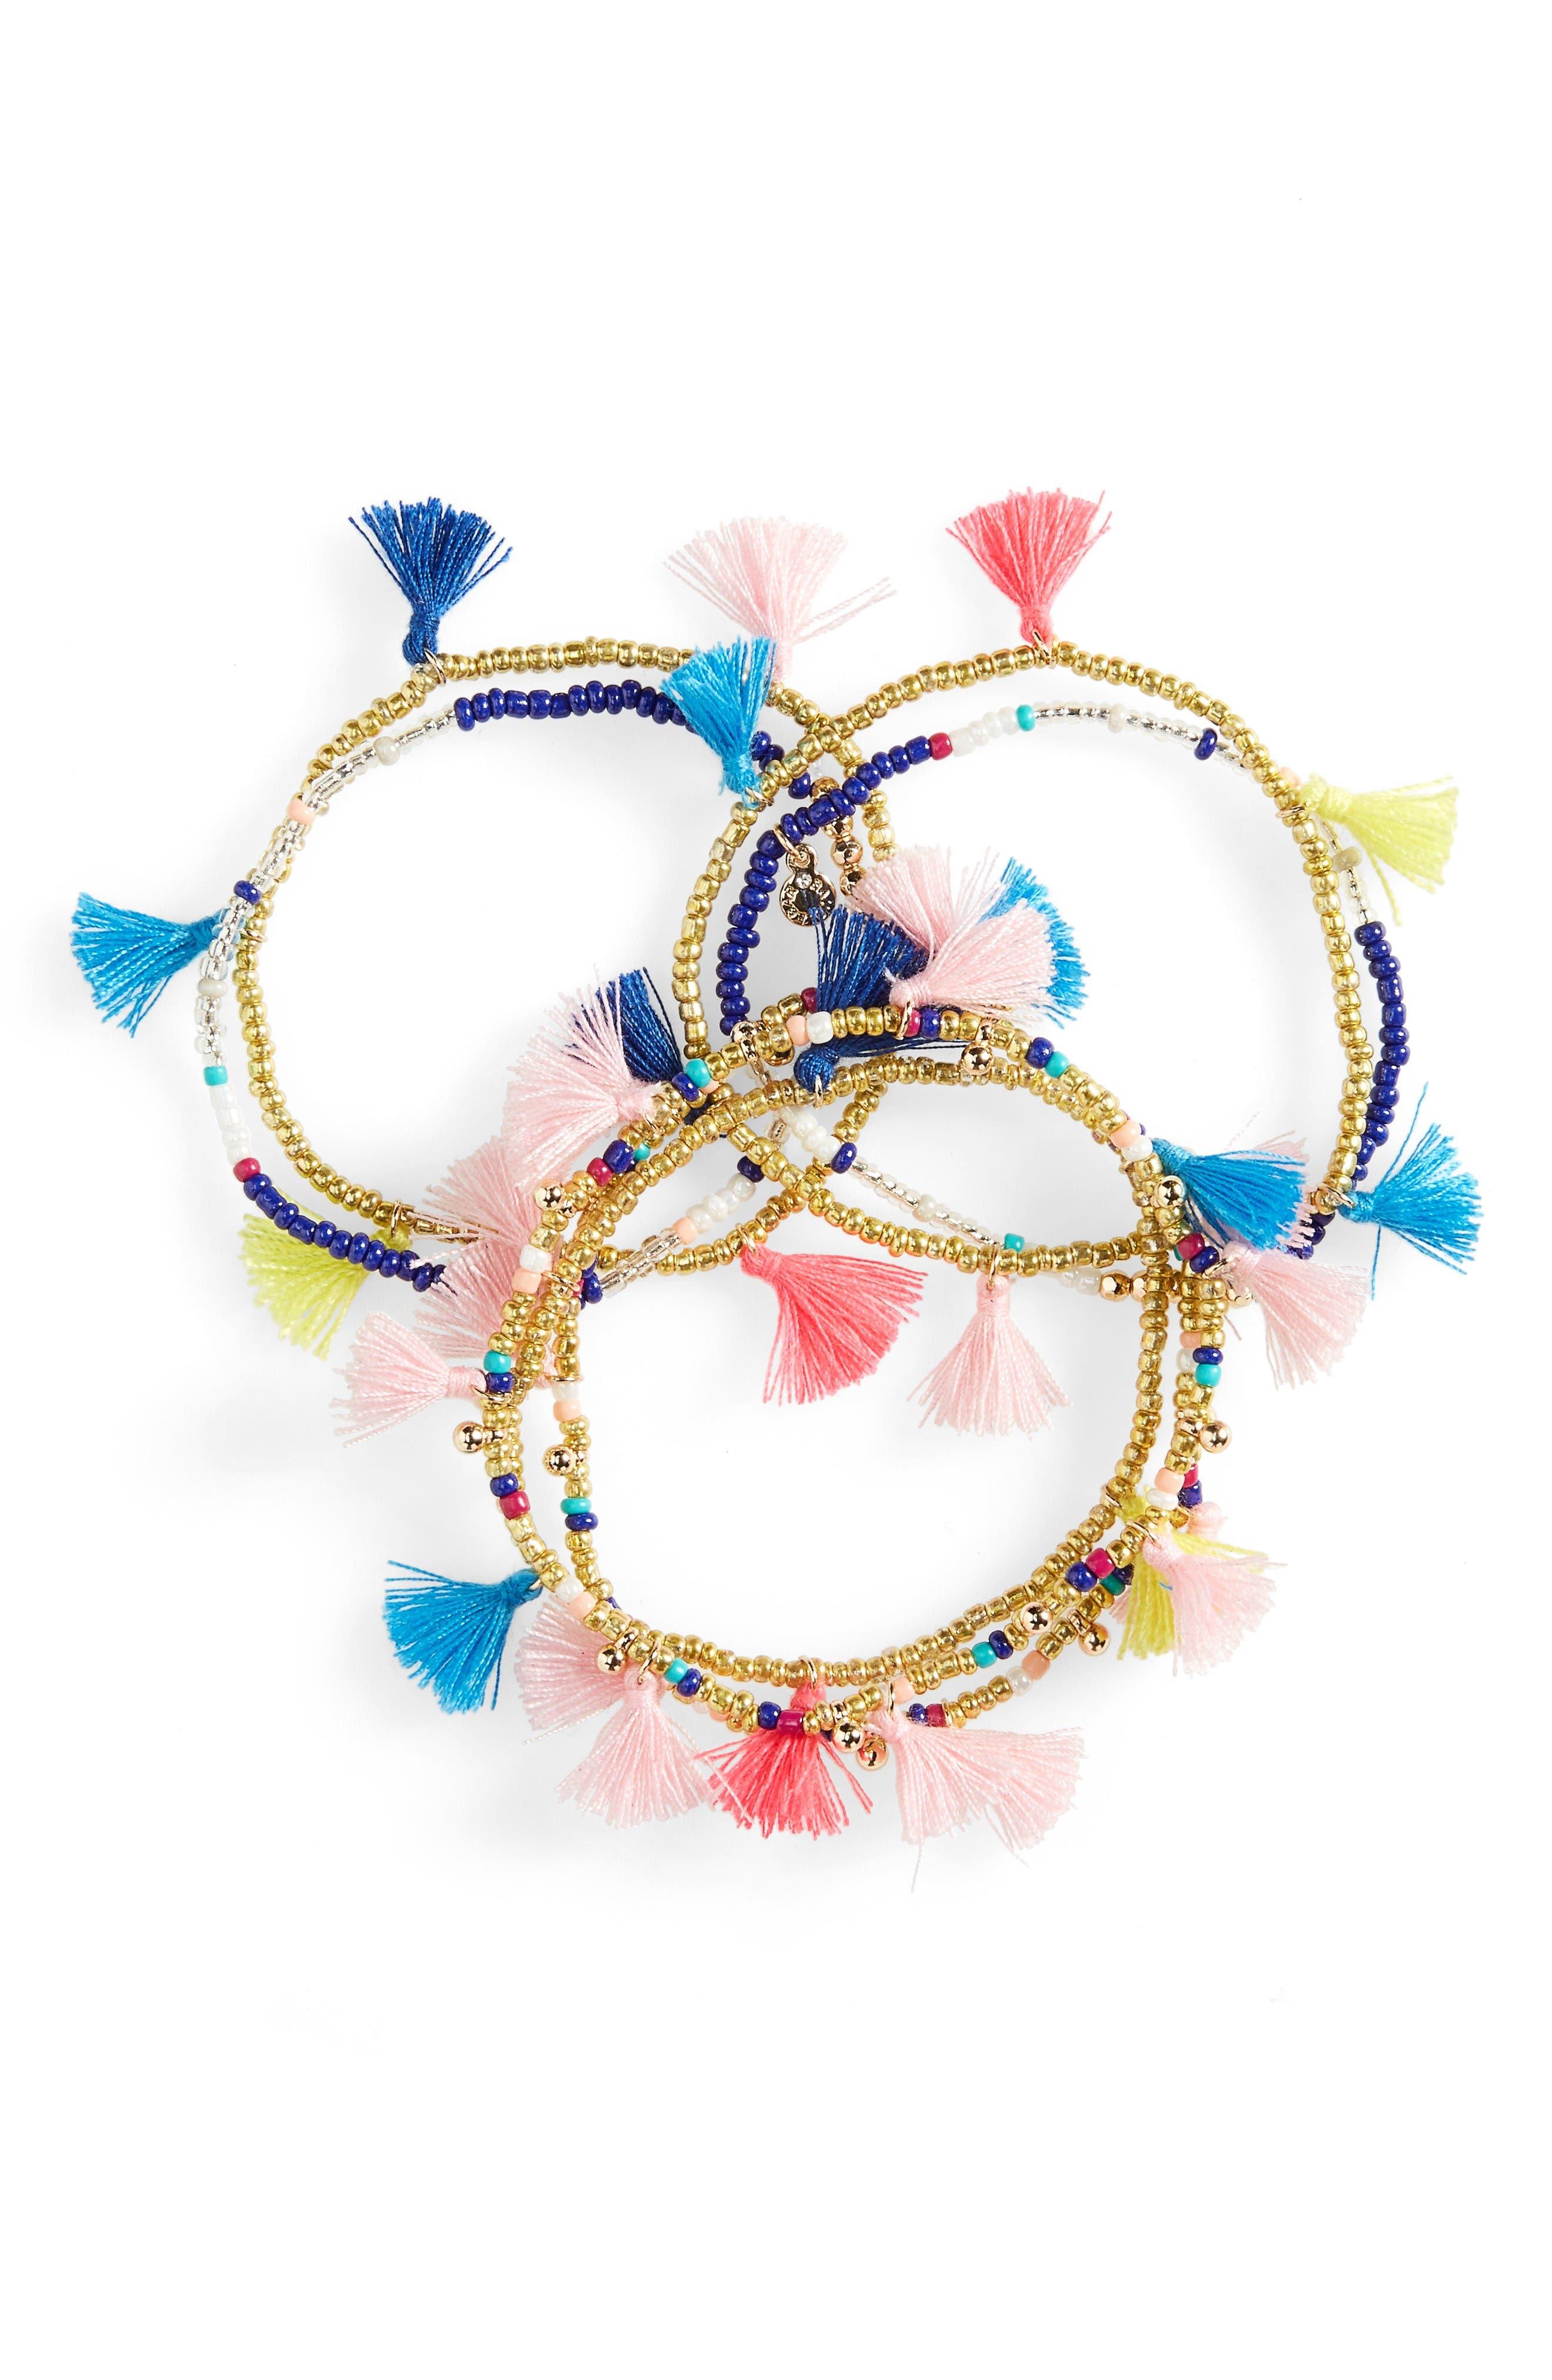 Main Image - BaubleBar Indy Set of 7 Stretch Bracelets